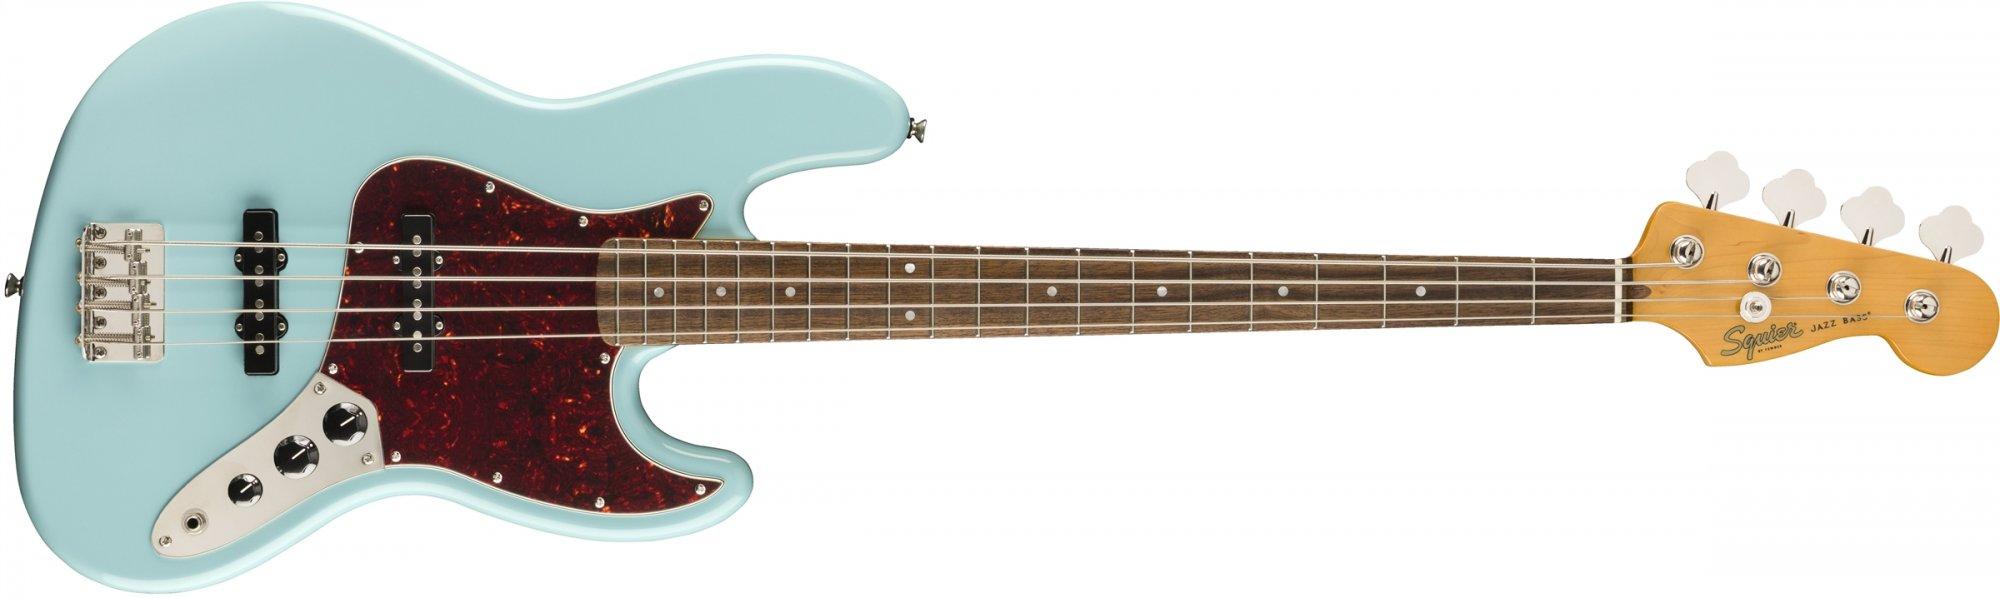 Jazz Bass  Squier CV  LRL DPB